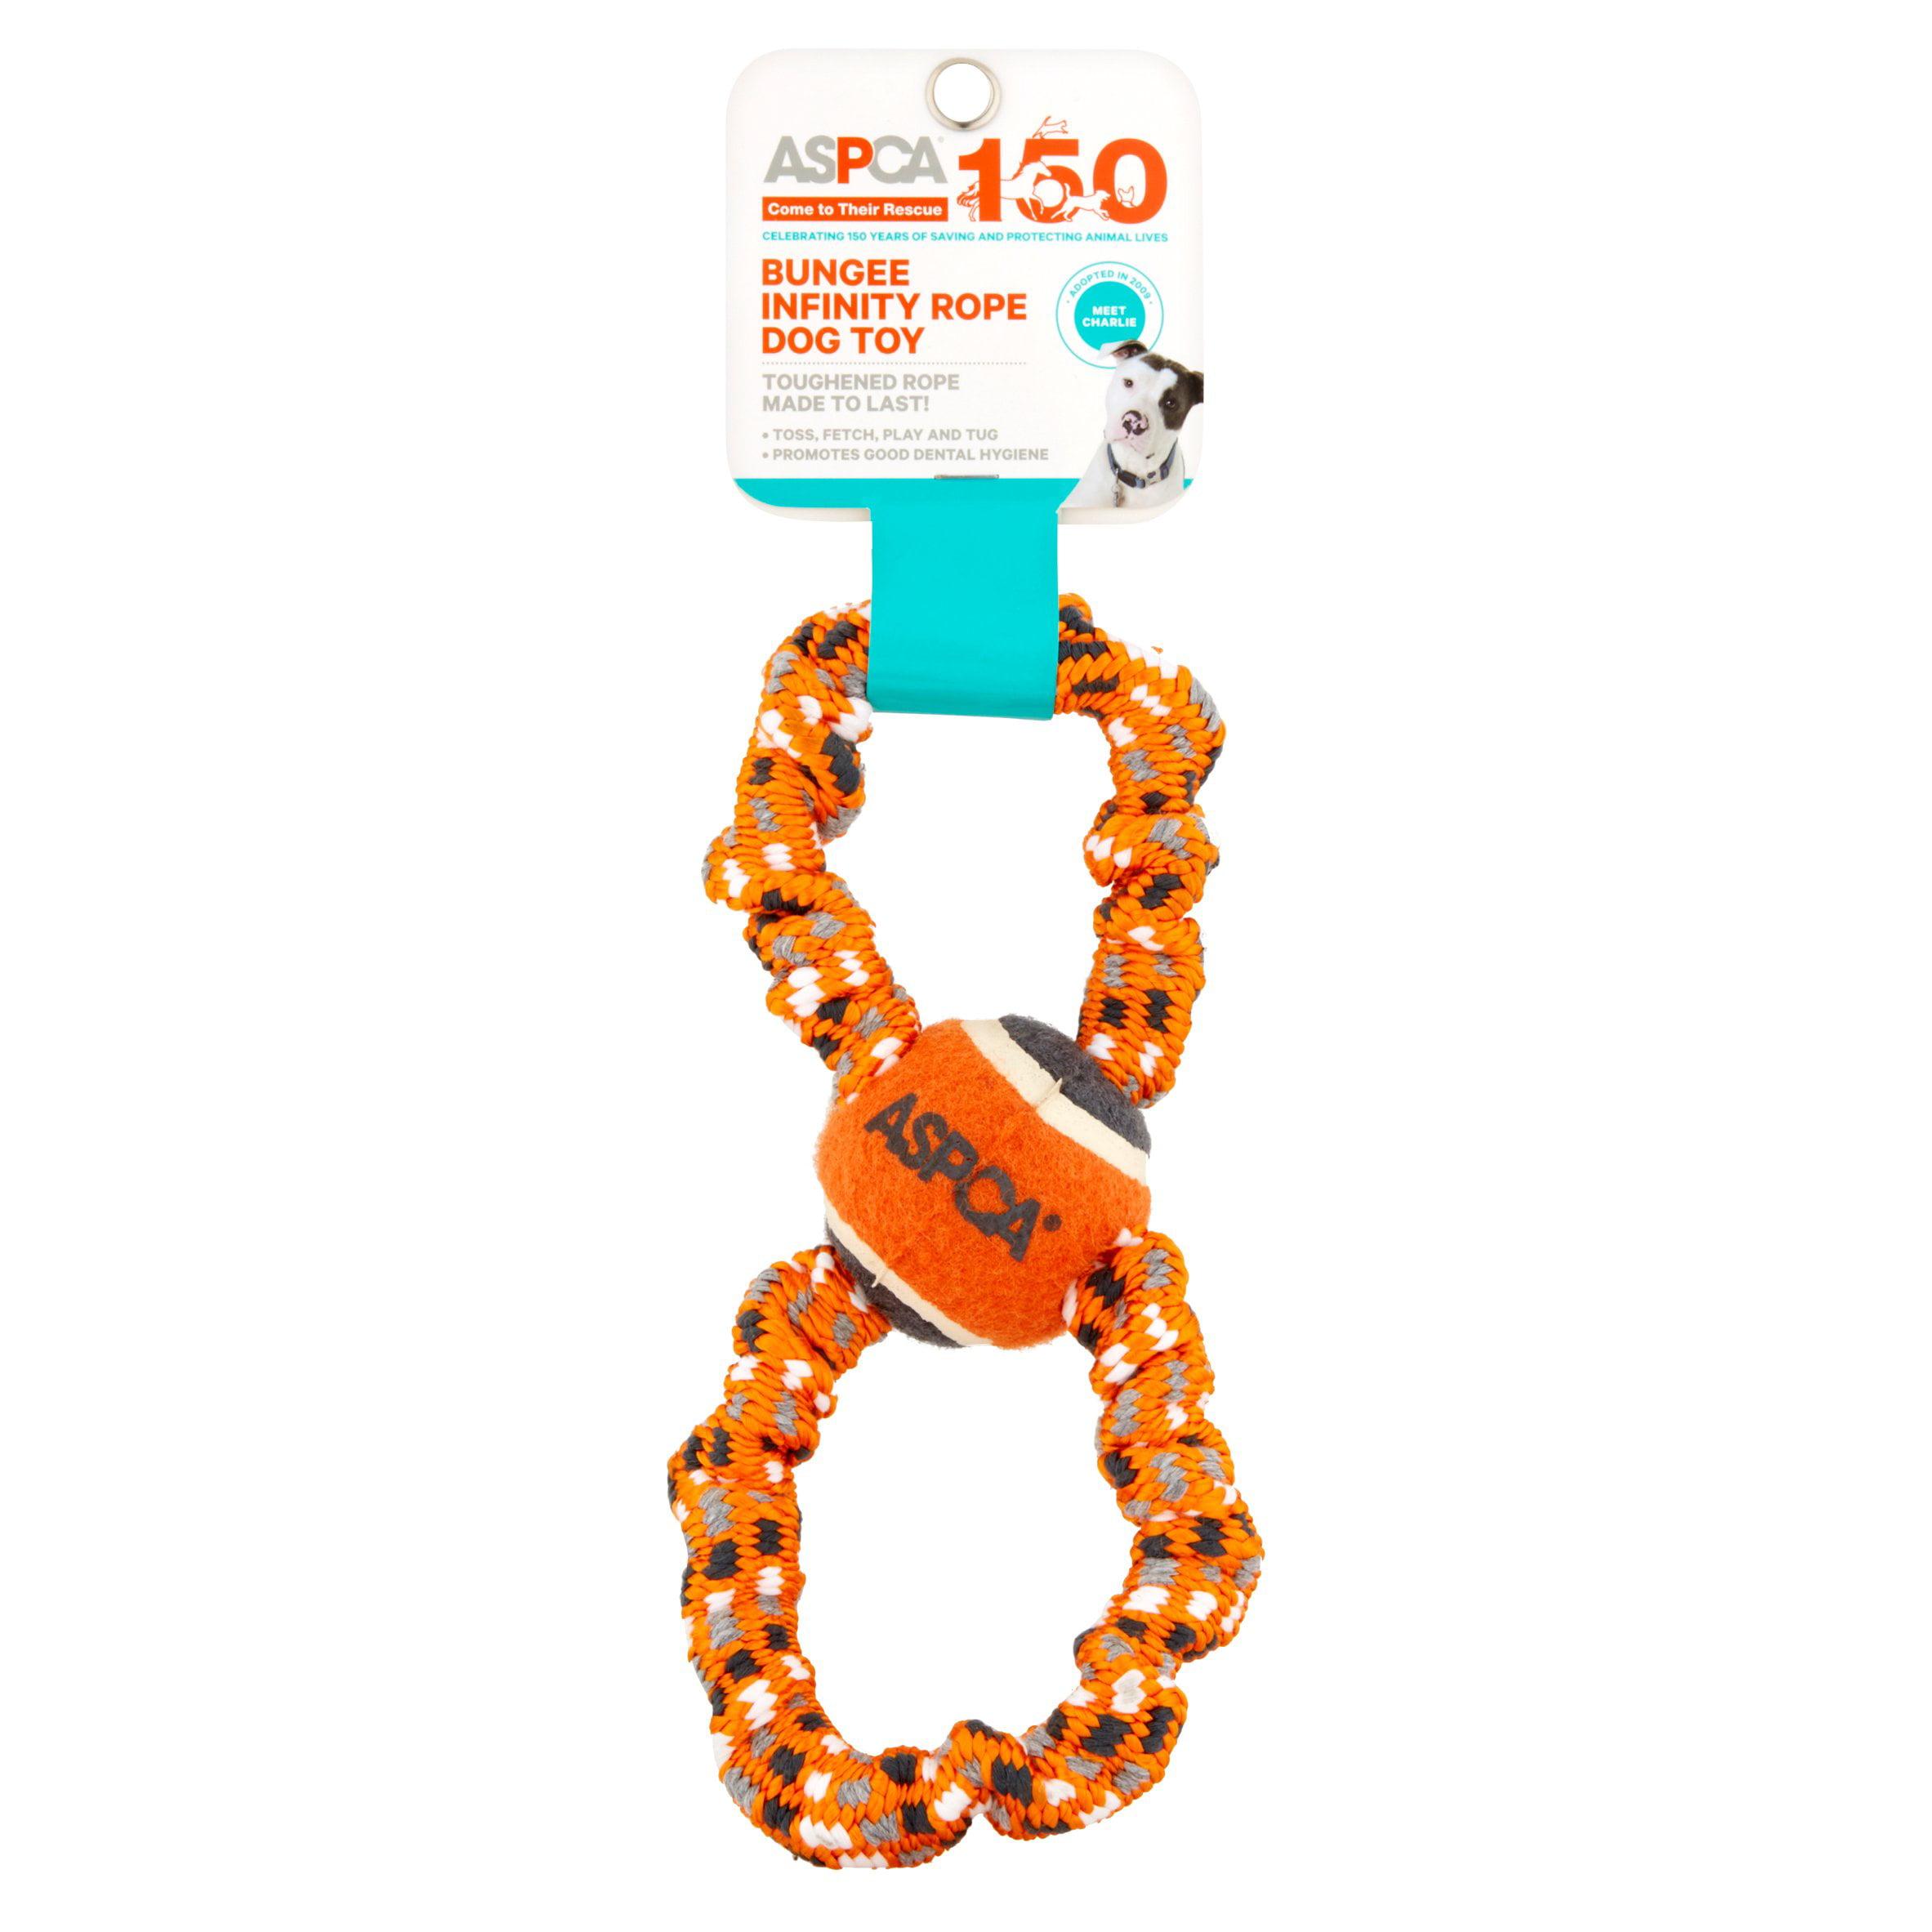 ASPCA Blue Bungee Infinity Rope Dog Toy by European Home Designs, LLC